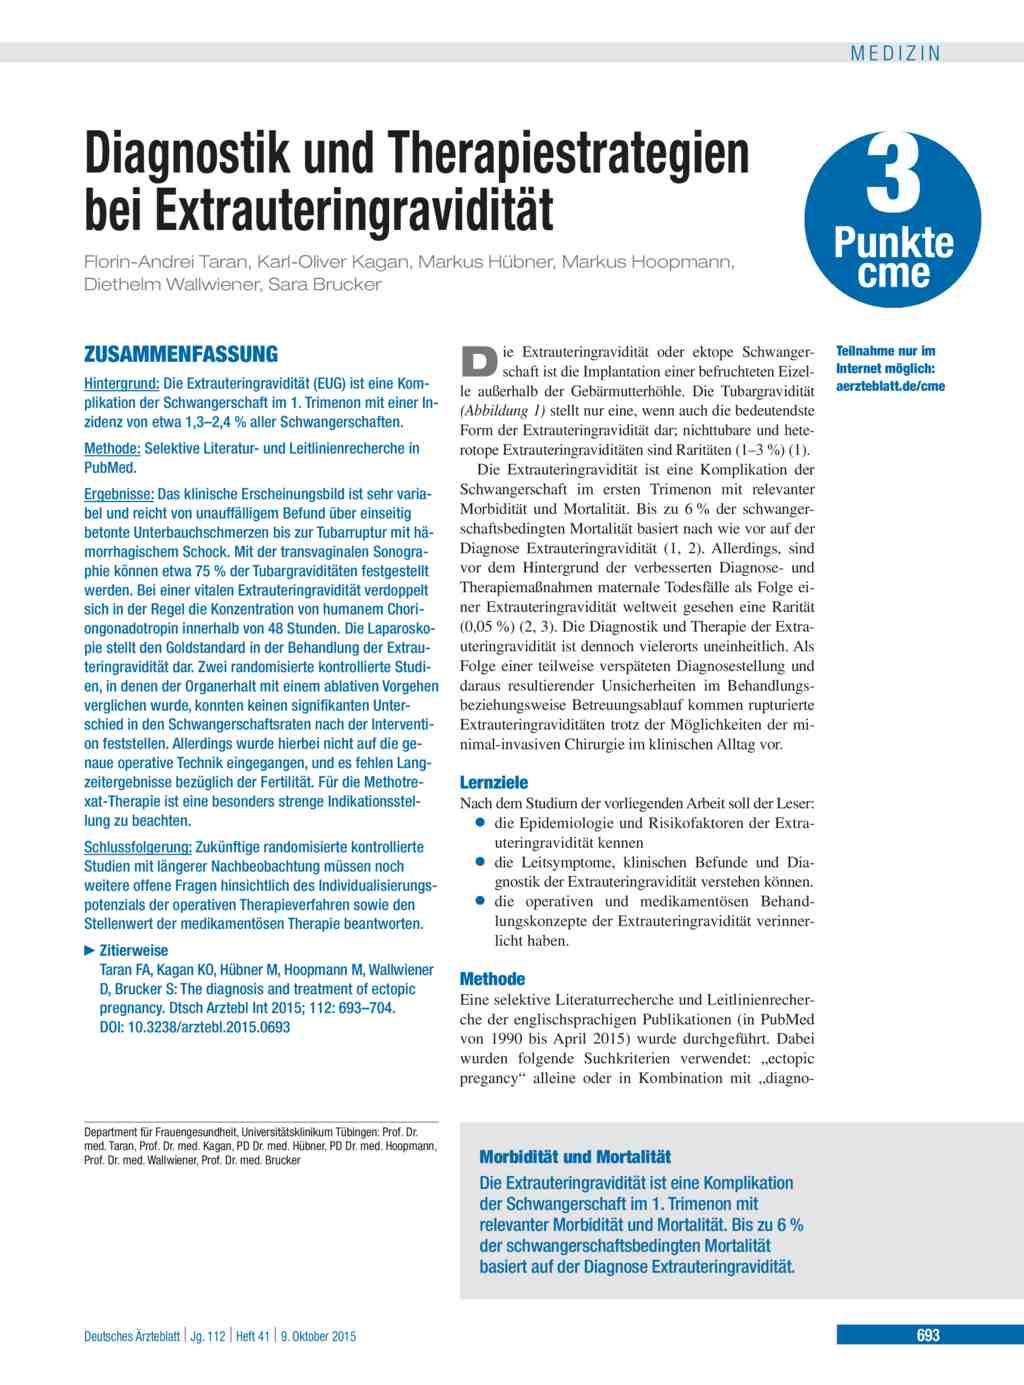 Diagnostik und Therapiestrategien bei Extrauteringravidität